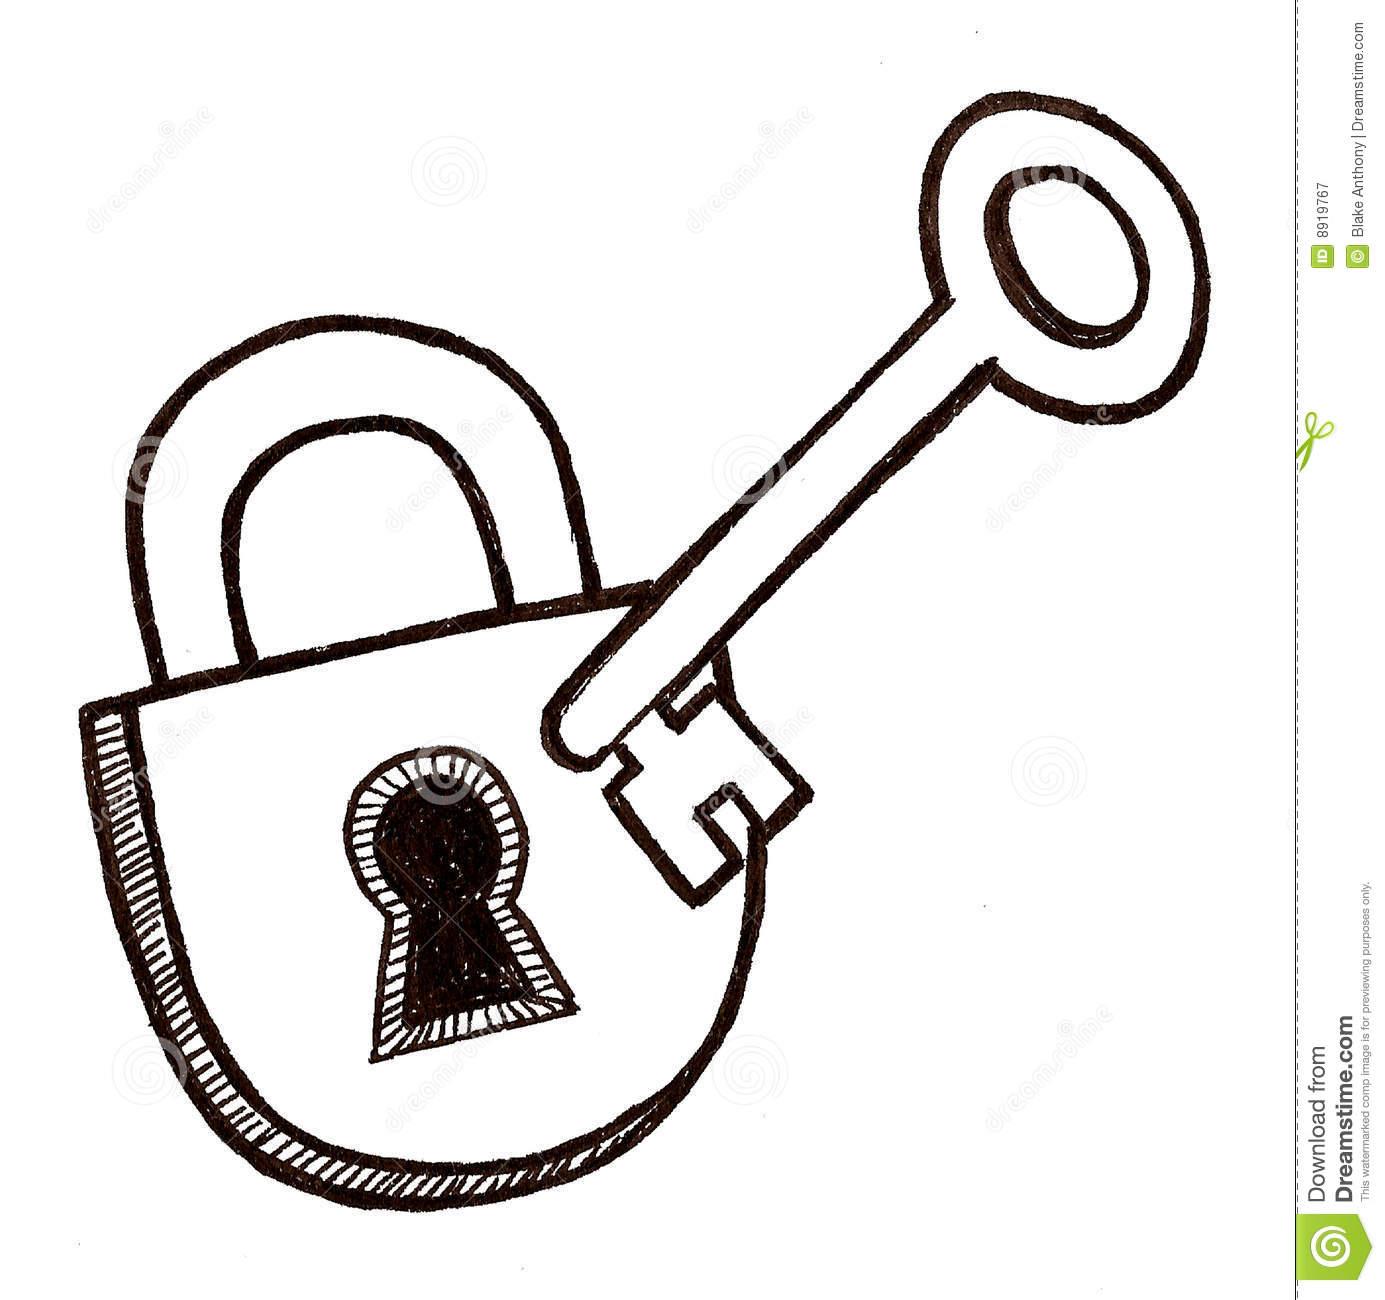 1385x1300 Clip Art Of Locks For Gates Clipart